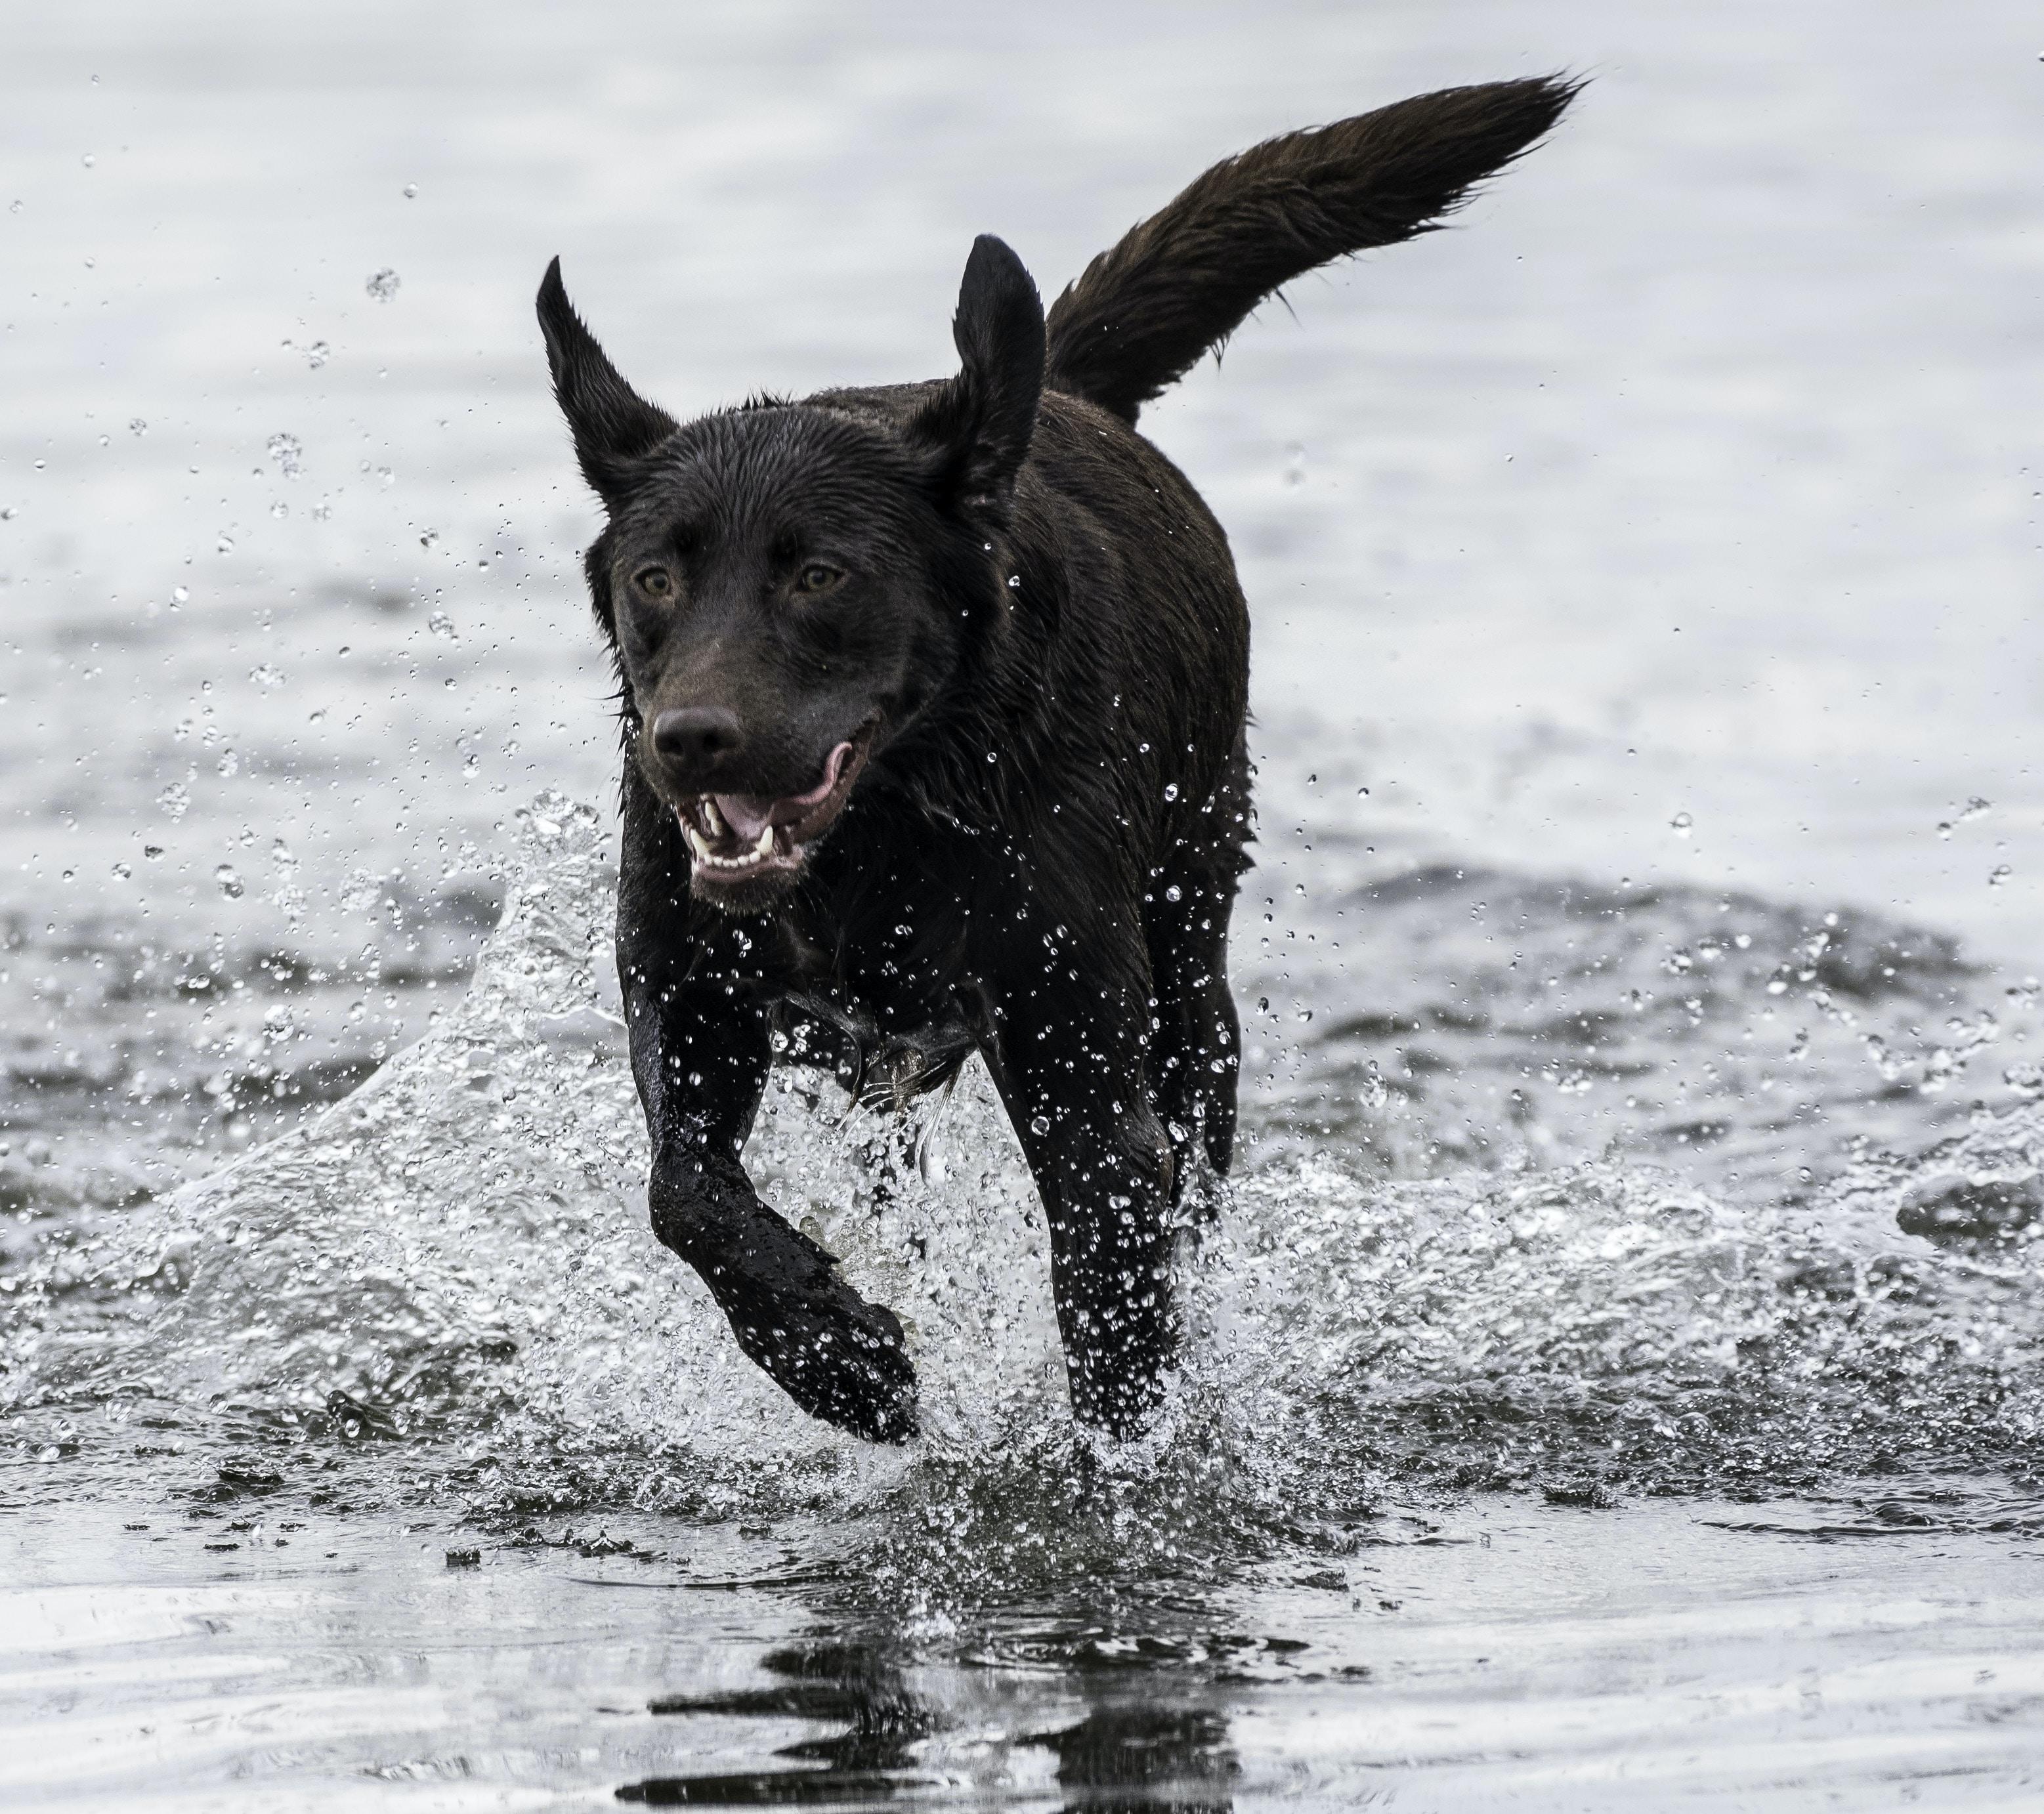 short-coated black dog running on body of water